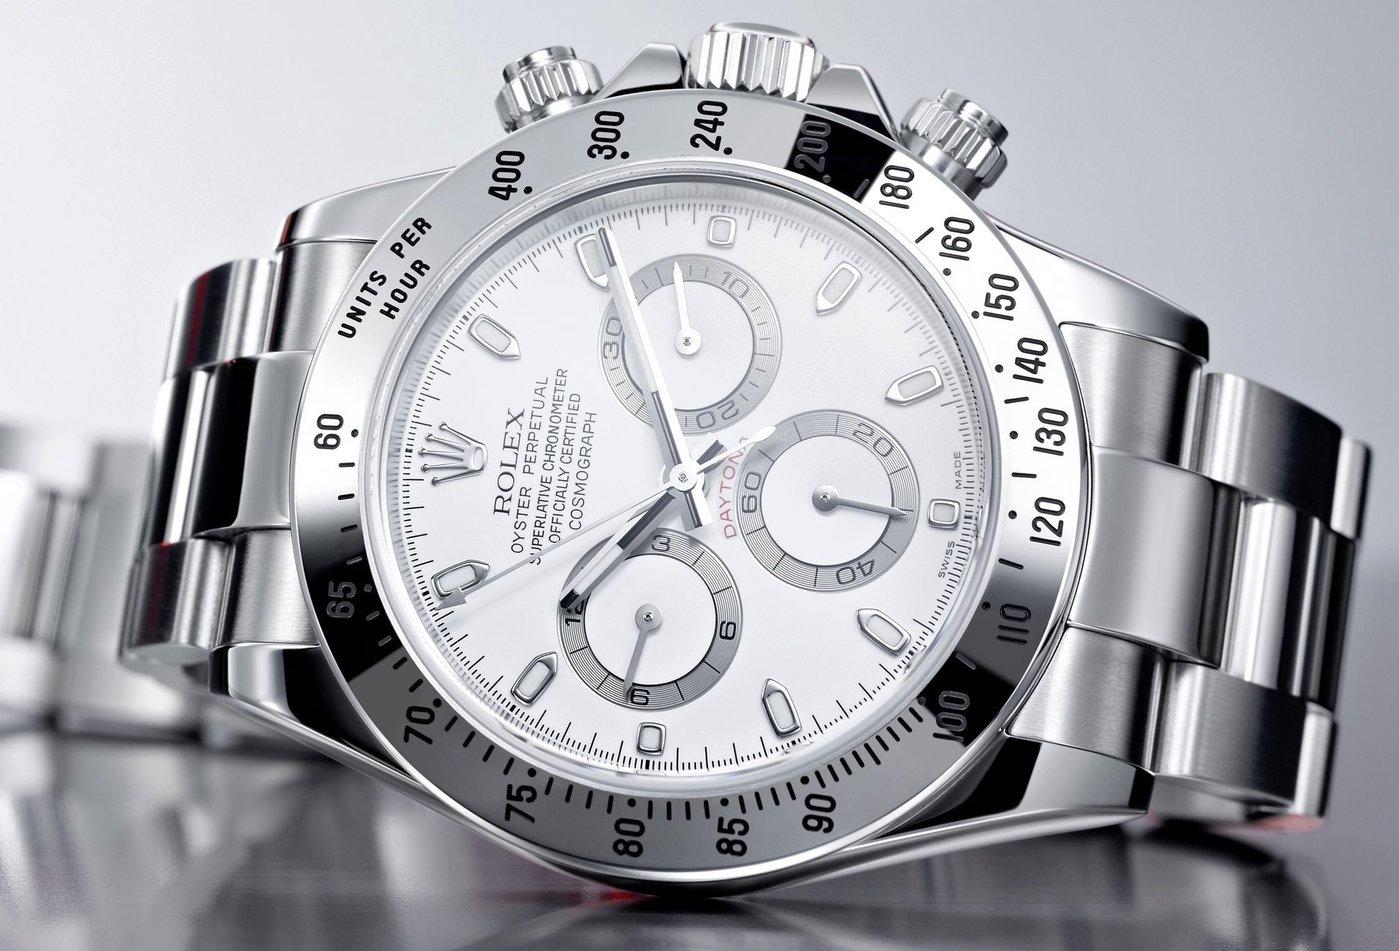 Rolex-Daytona-Steel-116520-white-dial.